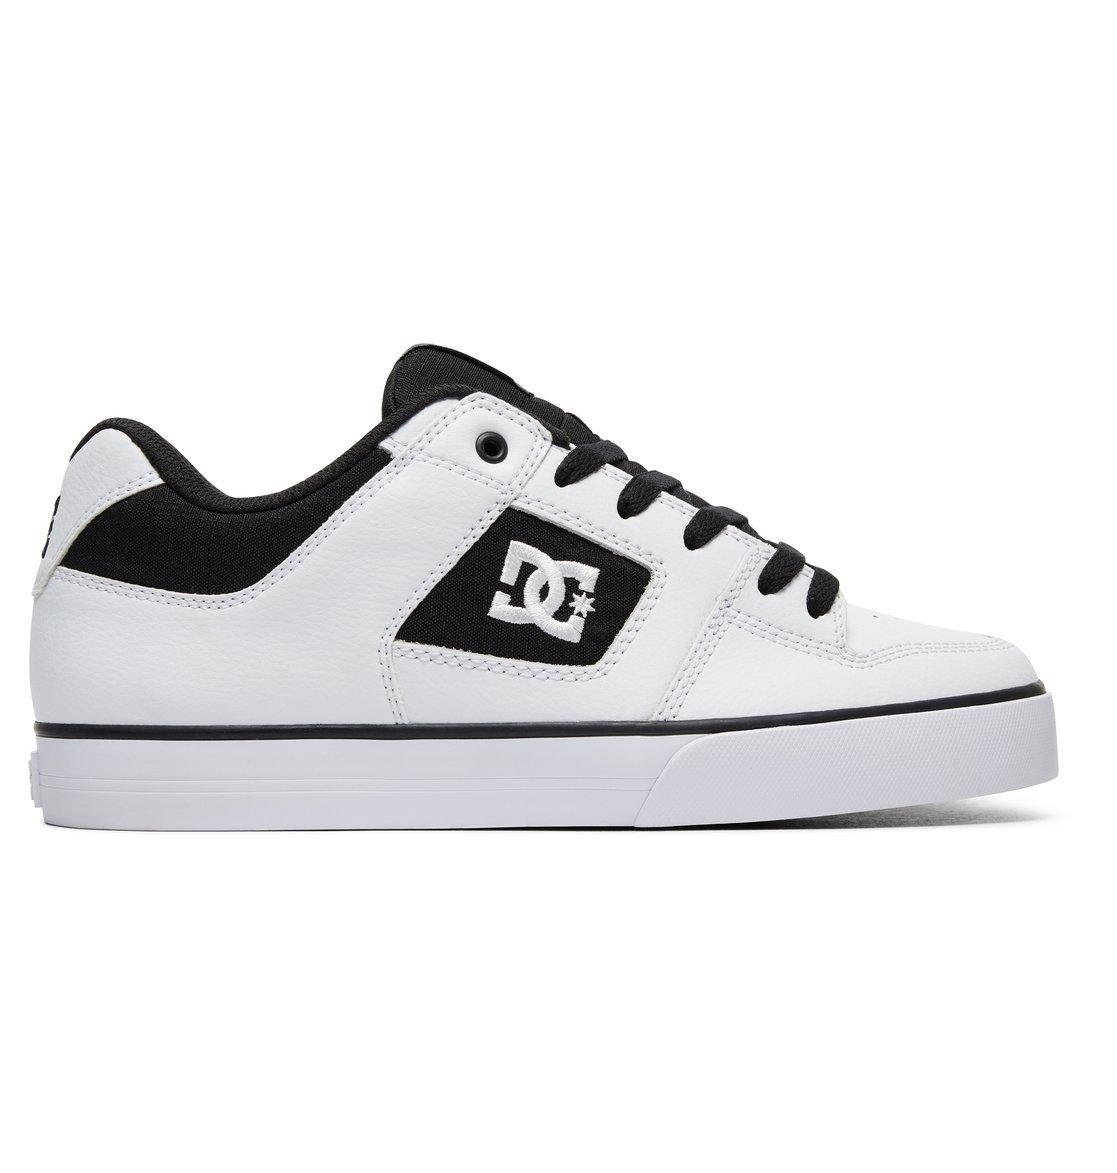 DC - Sneaker Pure 300660 - Black Athletic Red Bah 41 EU Blanco (Blanco/(Xwkw White/Black/White) Xwkw)